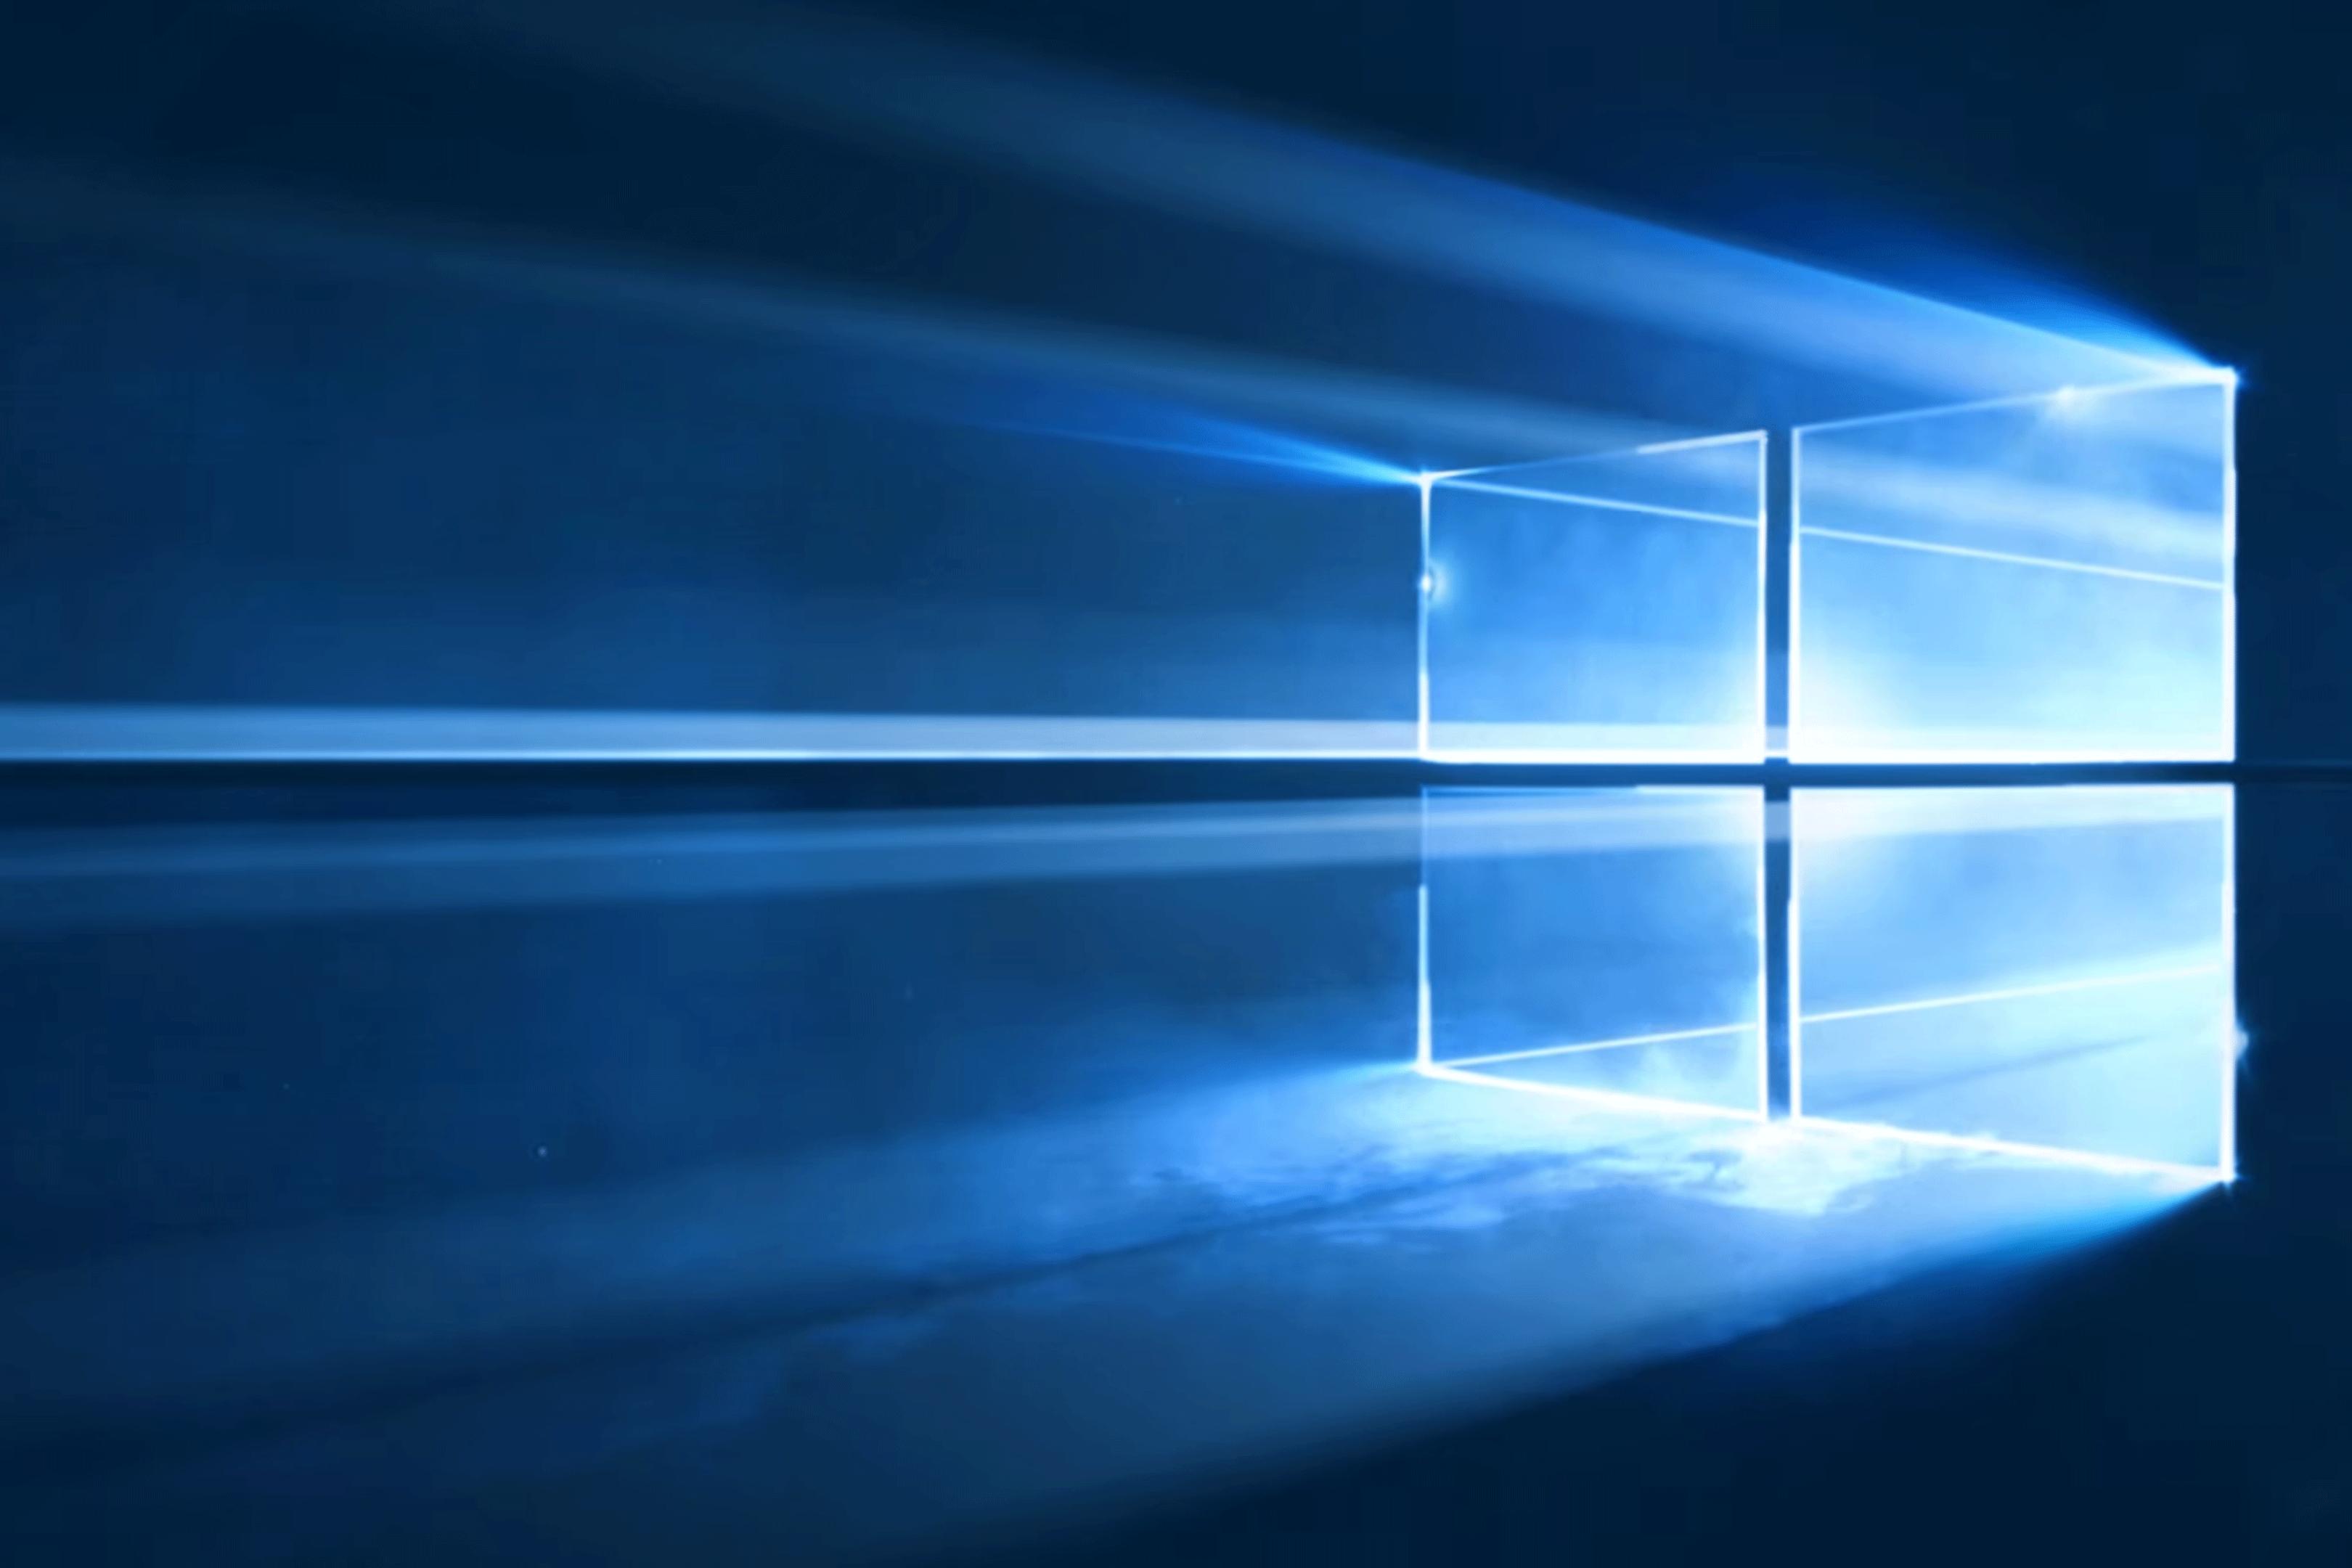 4k Wallpaper Microsoft: 4K Wallpapers For Windows 10